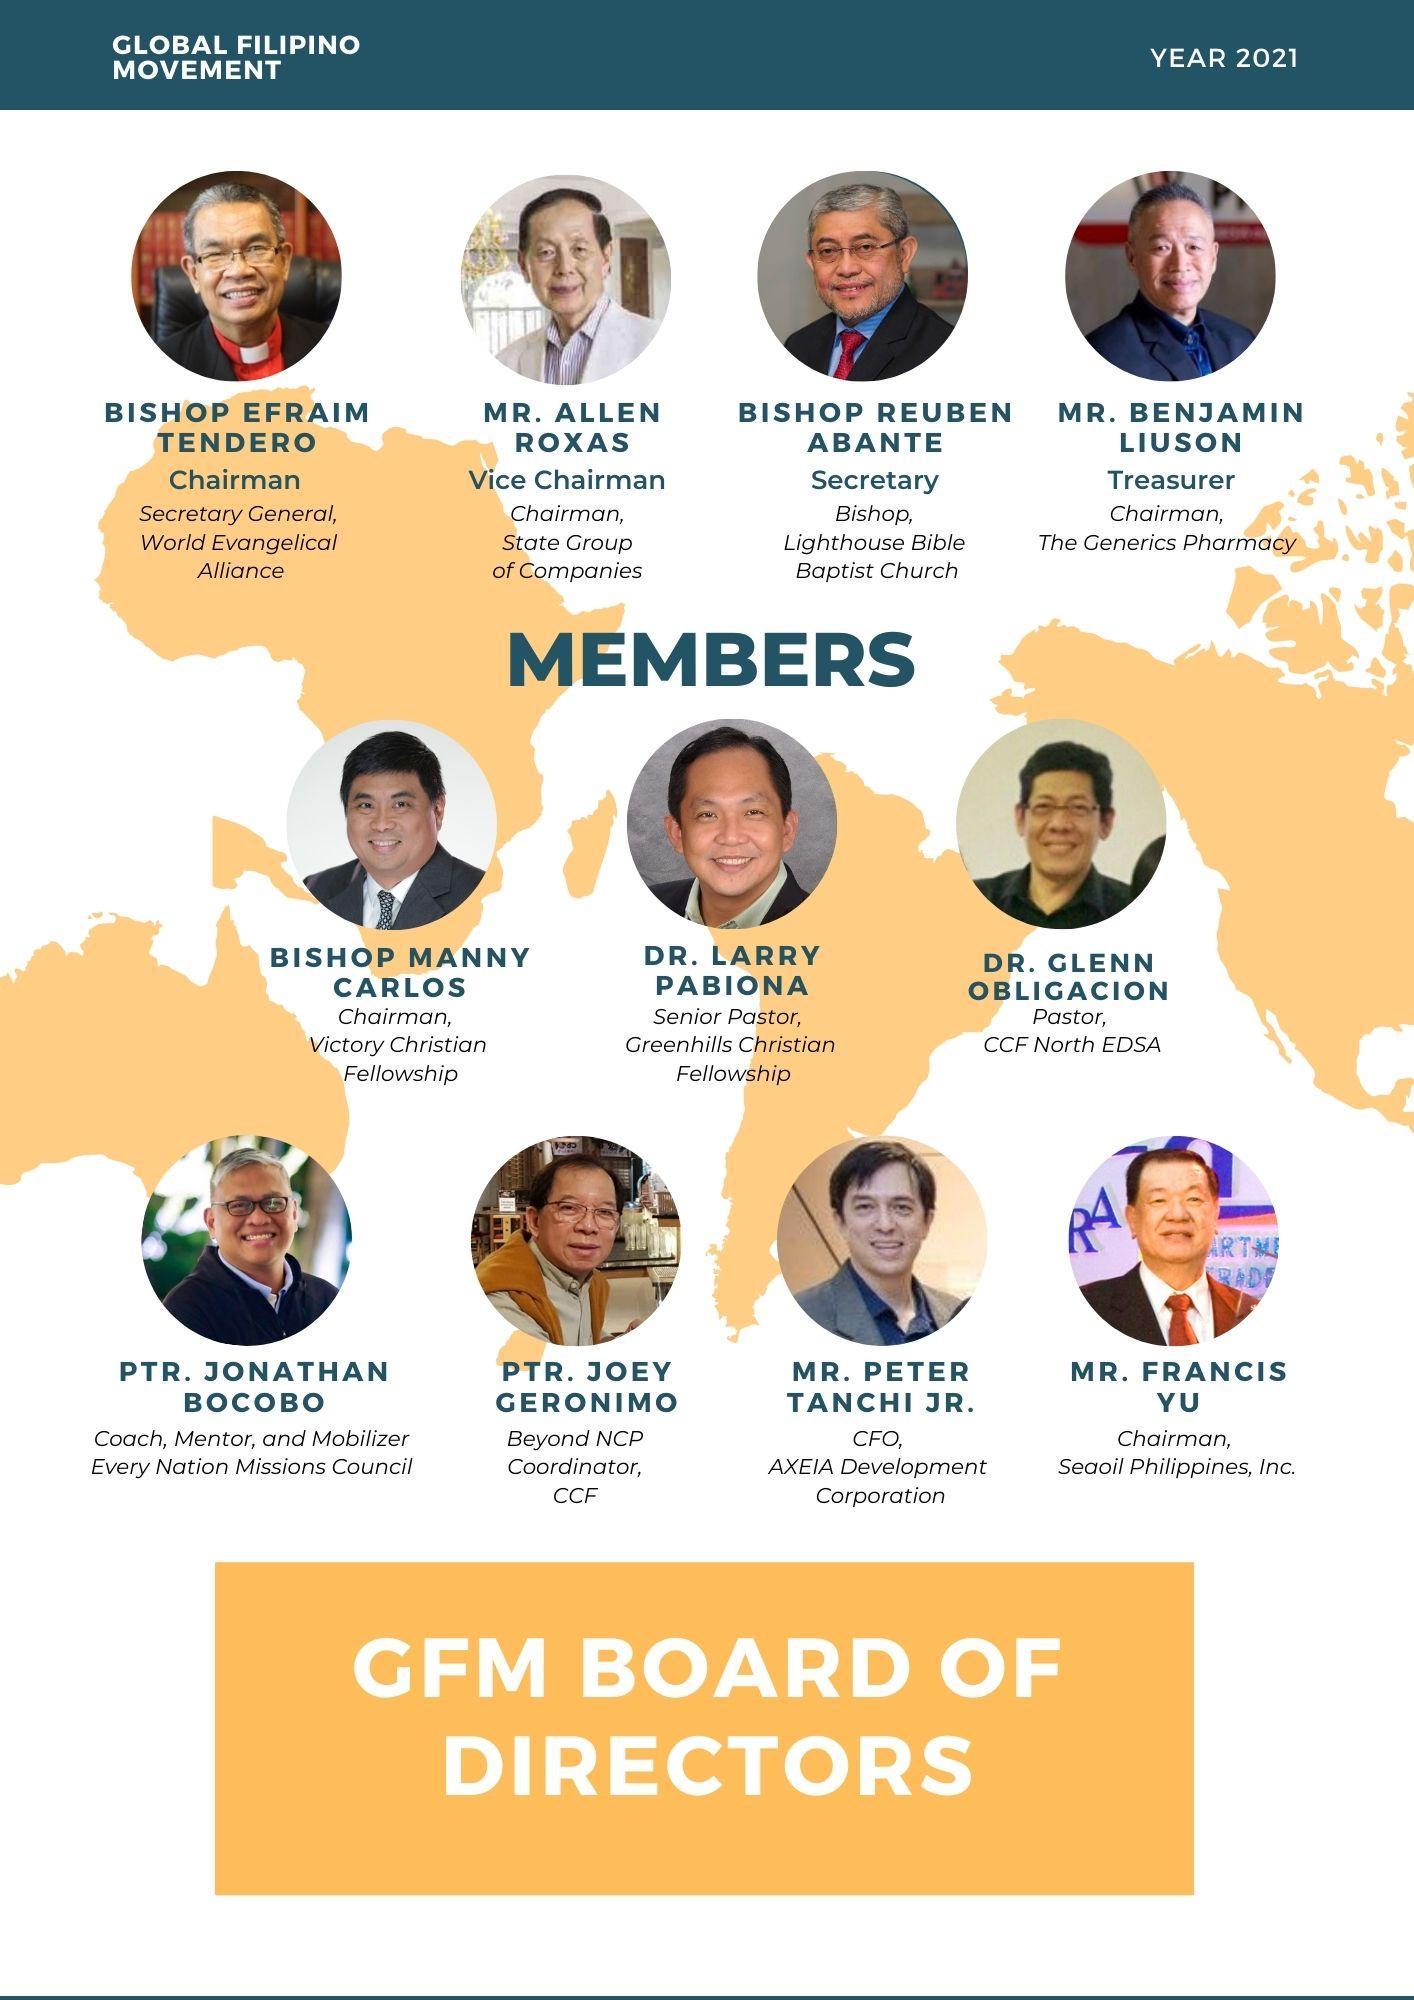 THE GFM BOARD OF DIRECTORS